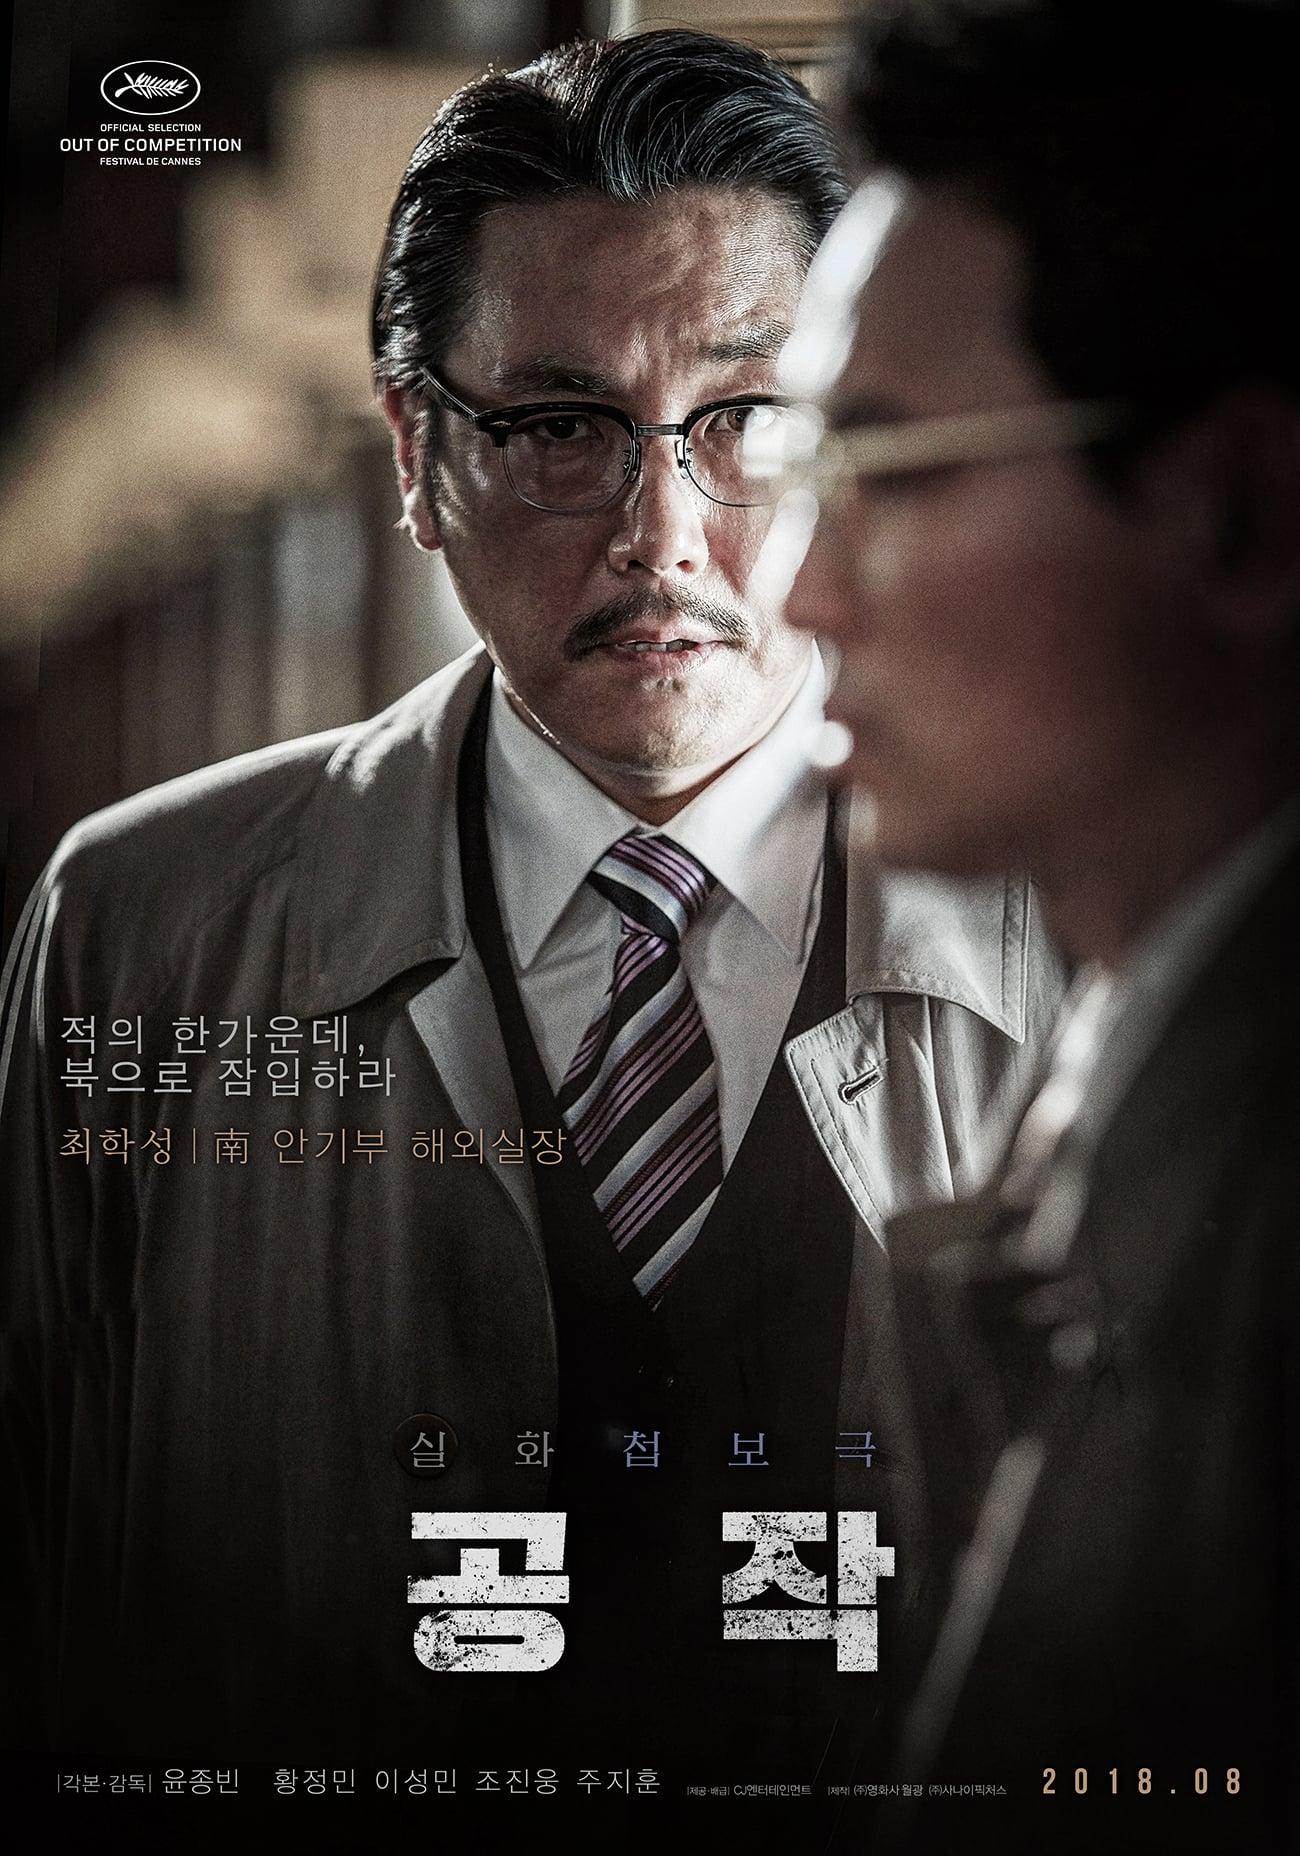 Opinie despre filmul sud-coreean The Spy Gone North (2018)